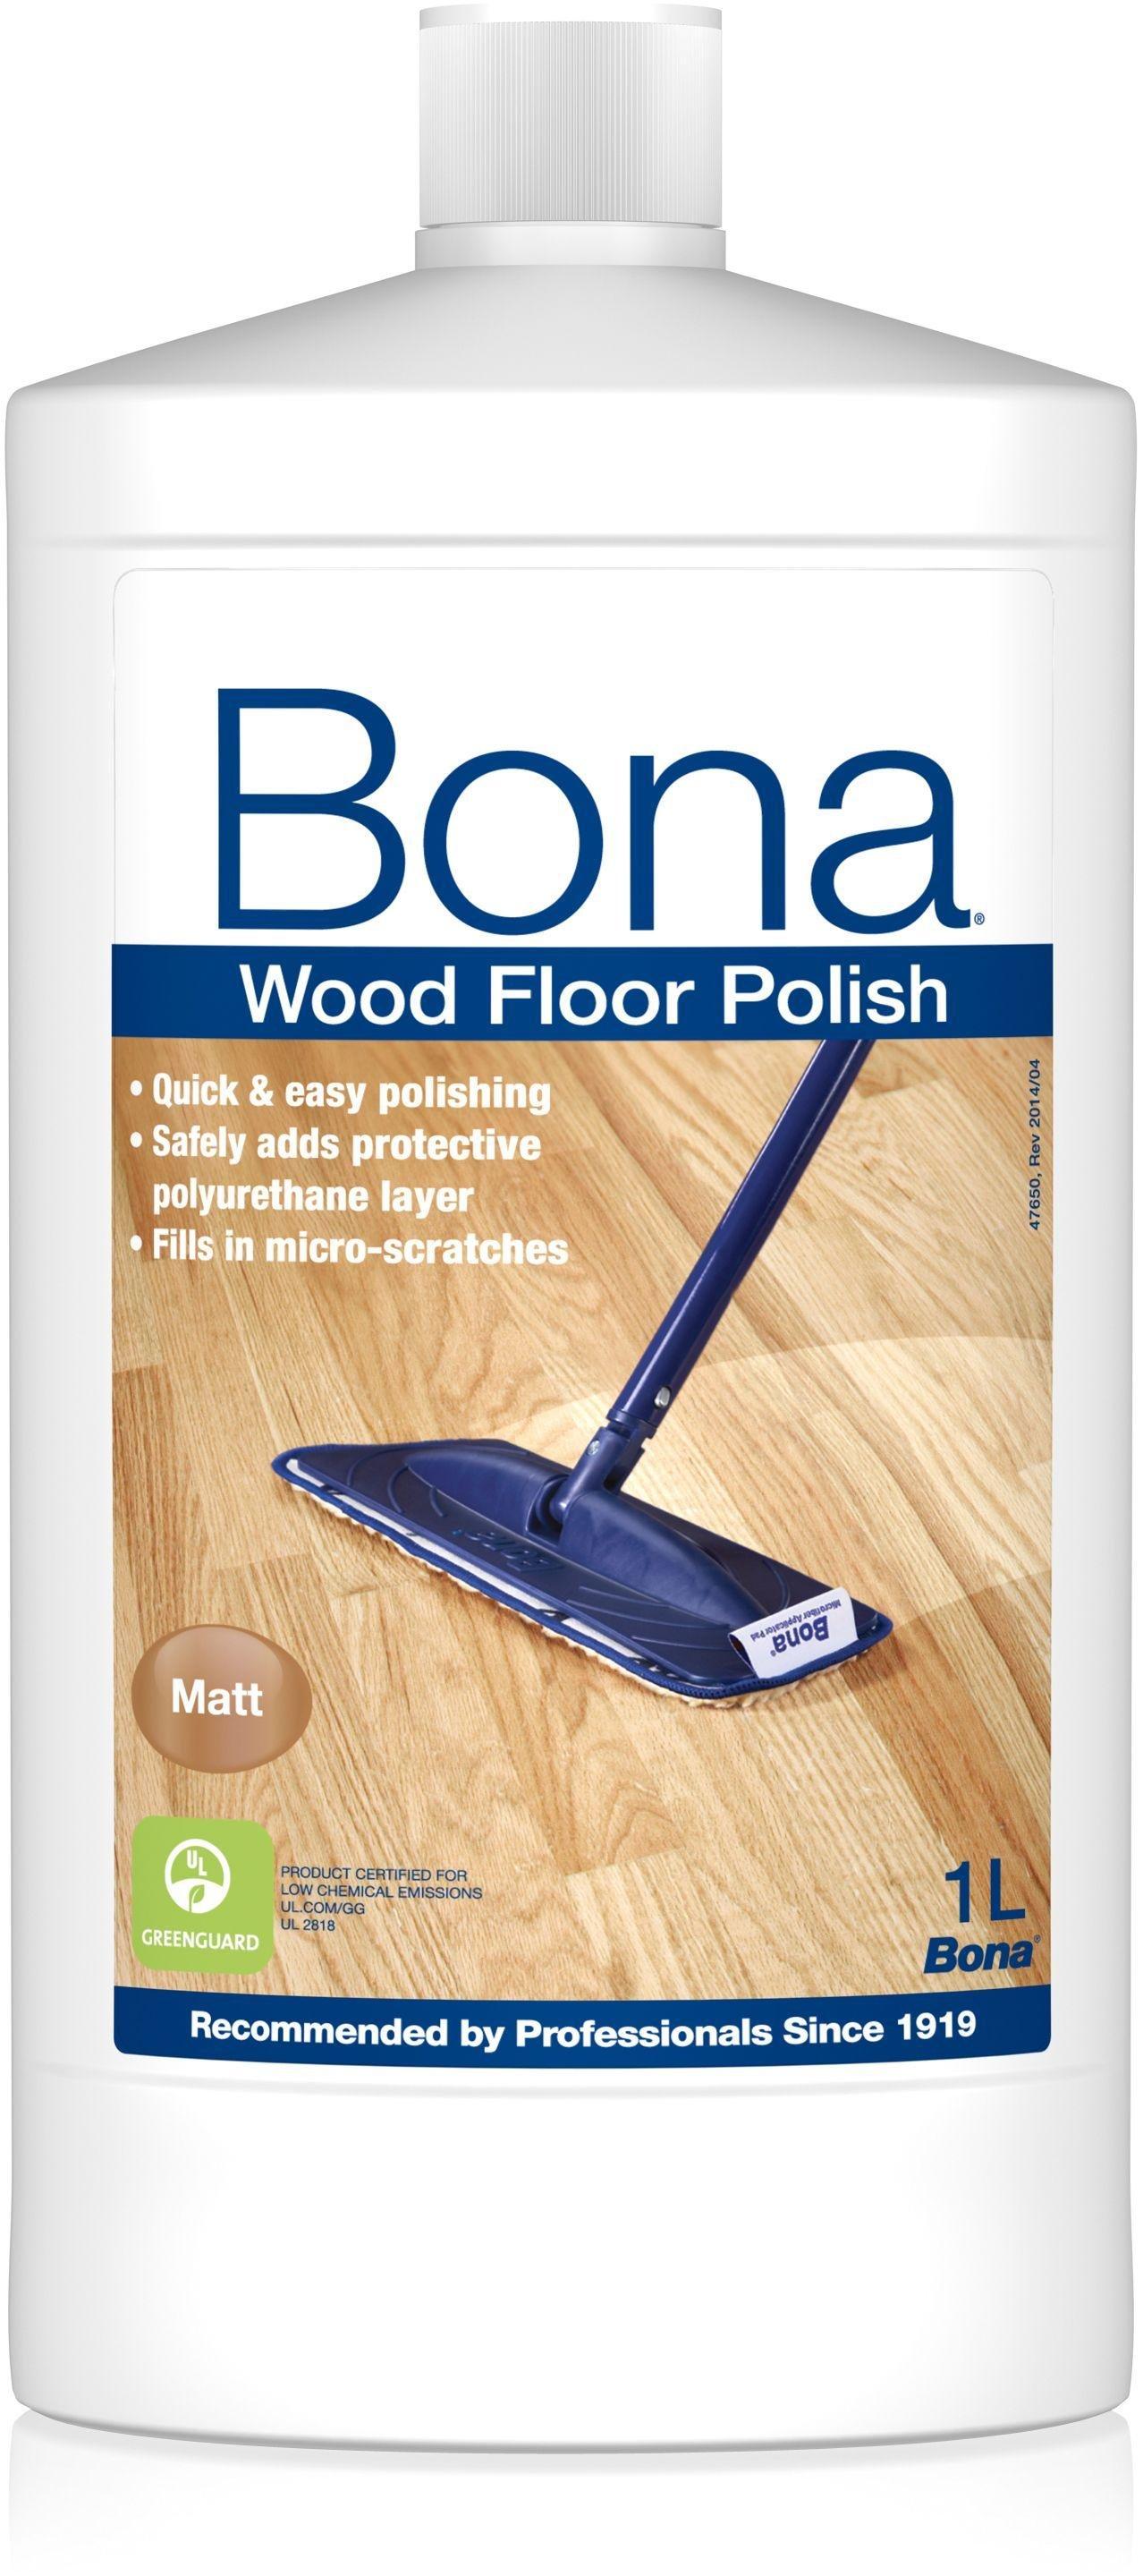 Bona 1L Wood Floor Polish - Matt